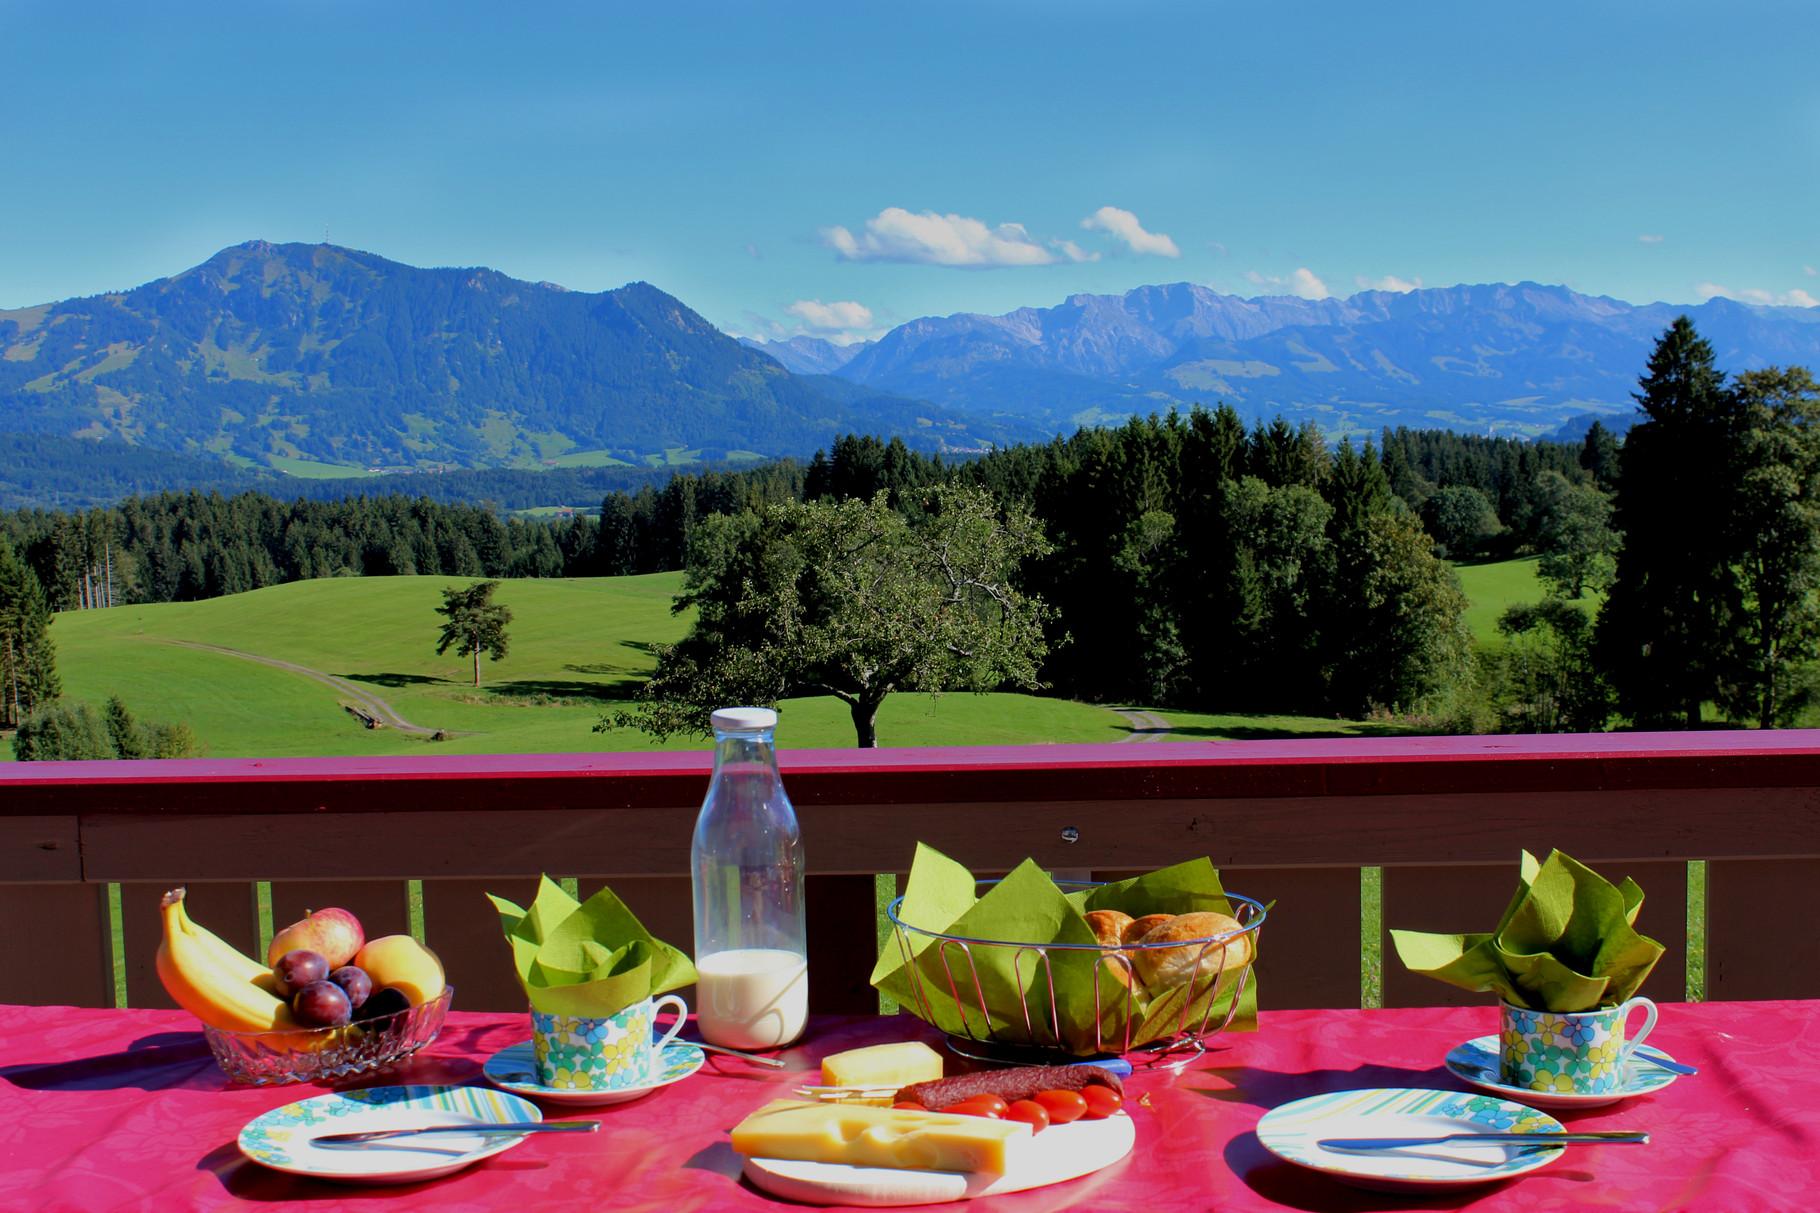 Ihr Frühstücksplatz im Allgäu